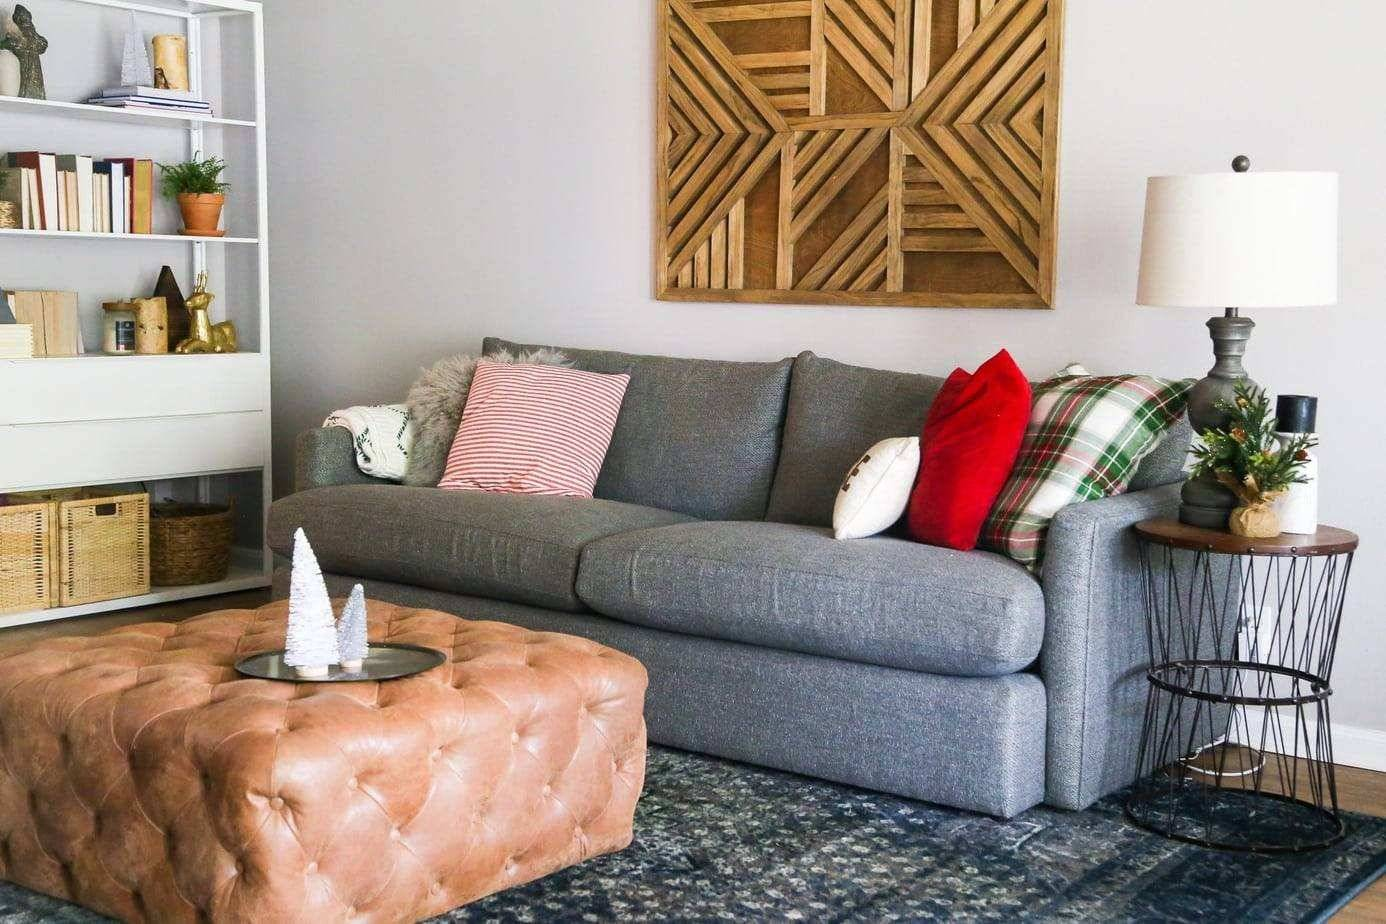 wohnzimmer deko dunkelgrun luxury sofa 2019 01 14t10 20 21 00 of wohnzimmer deko dunkelgrun